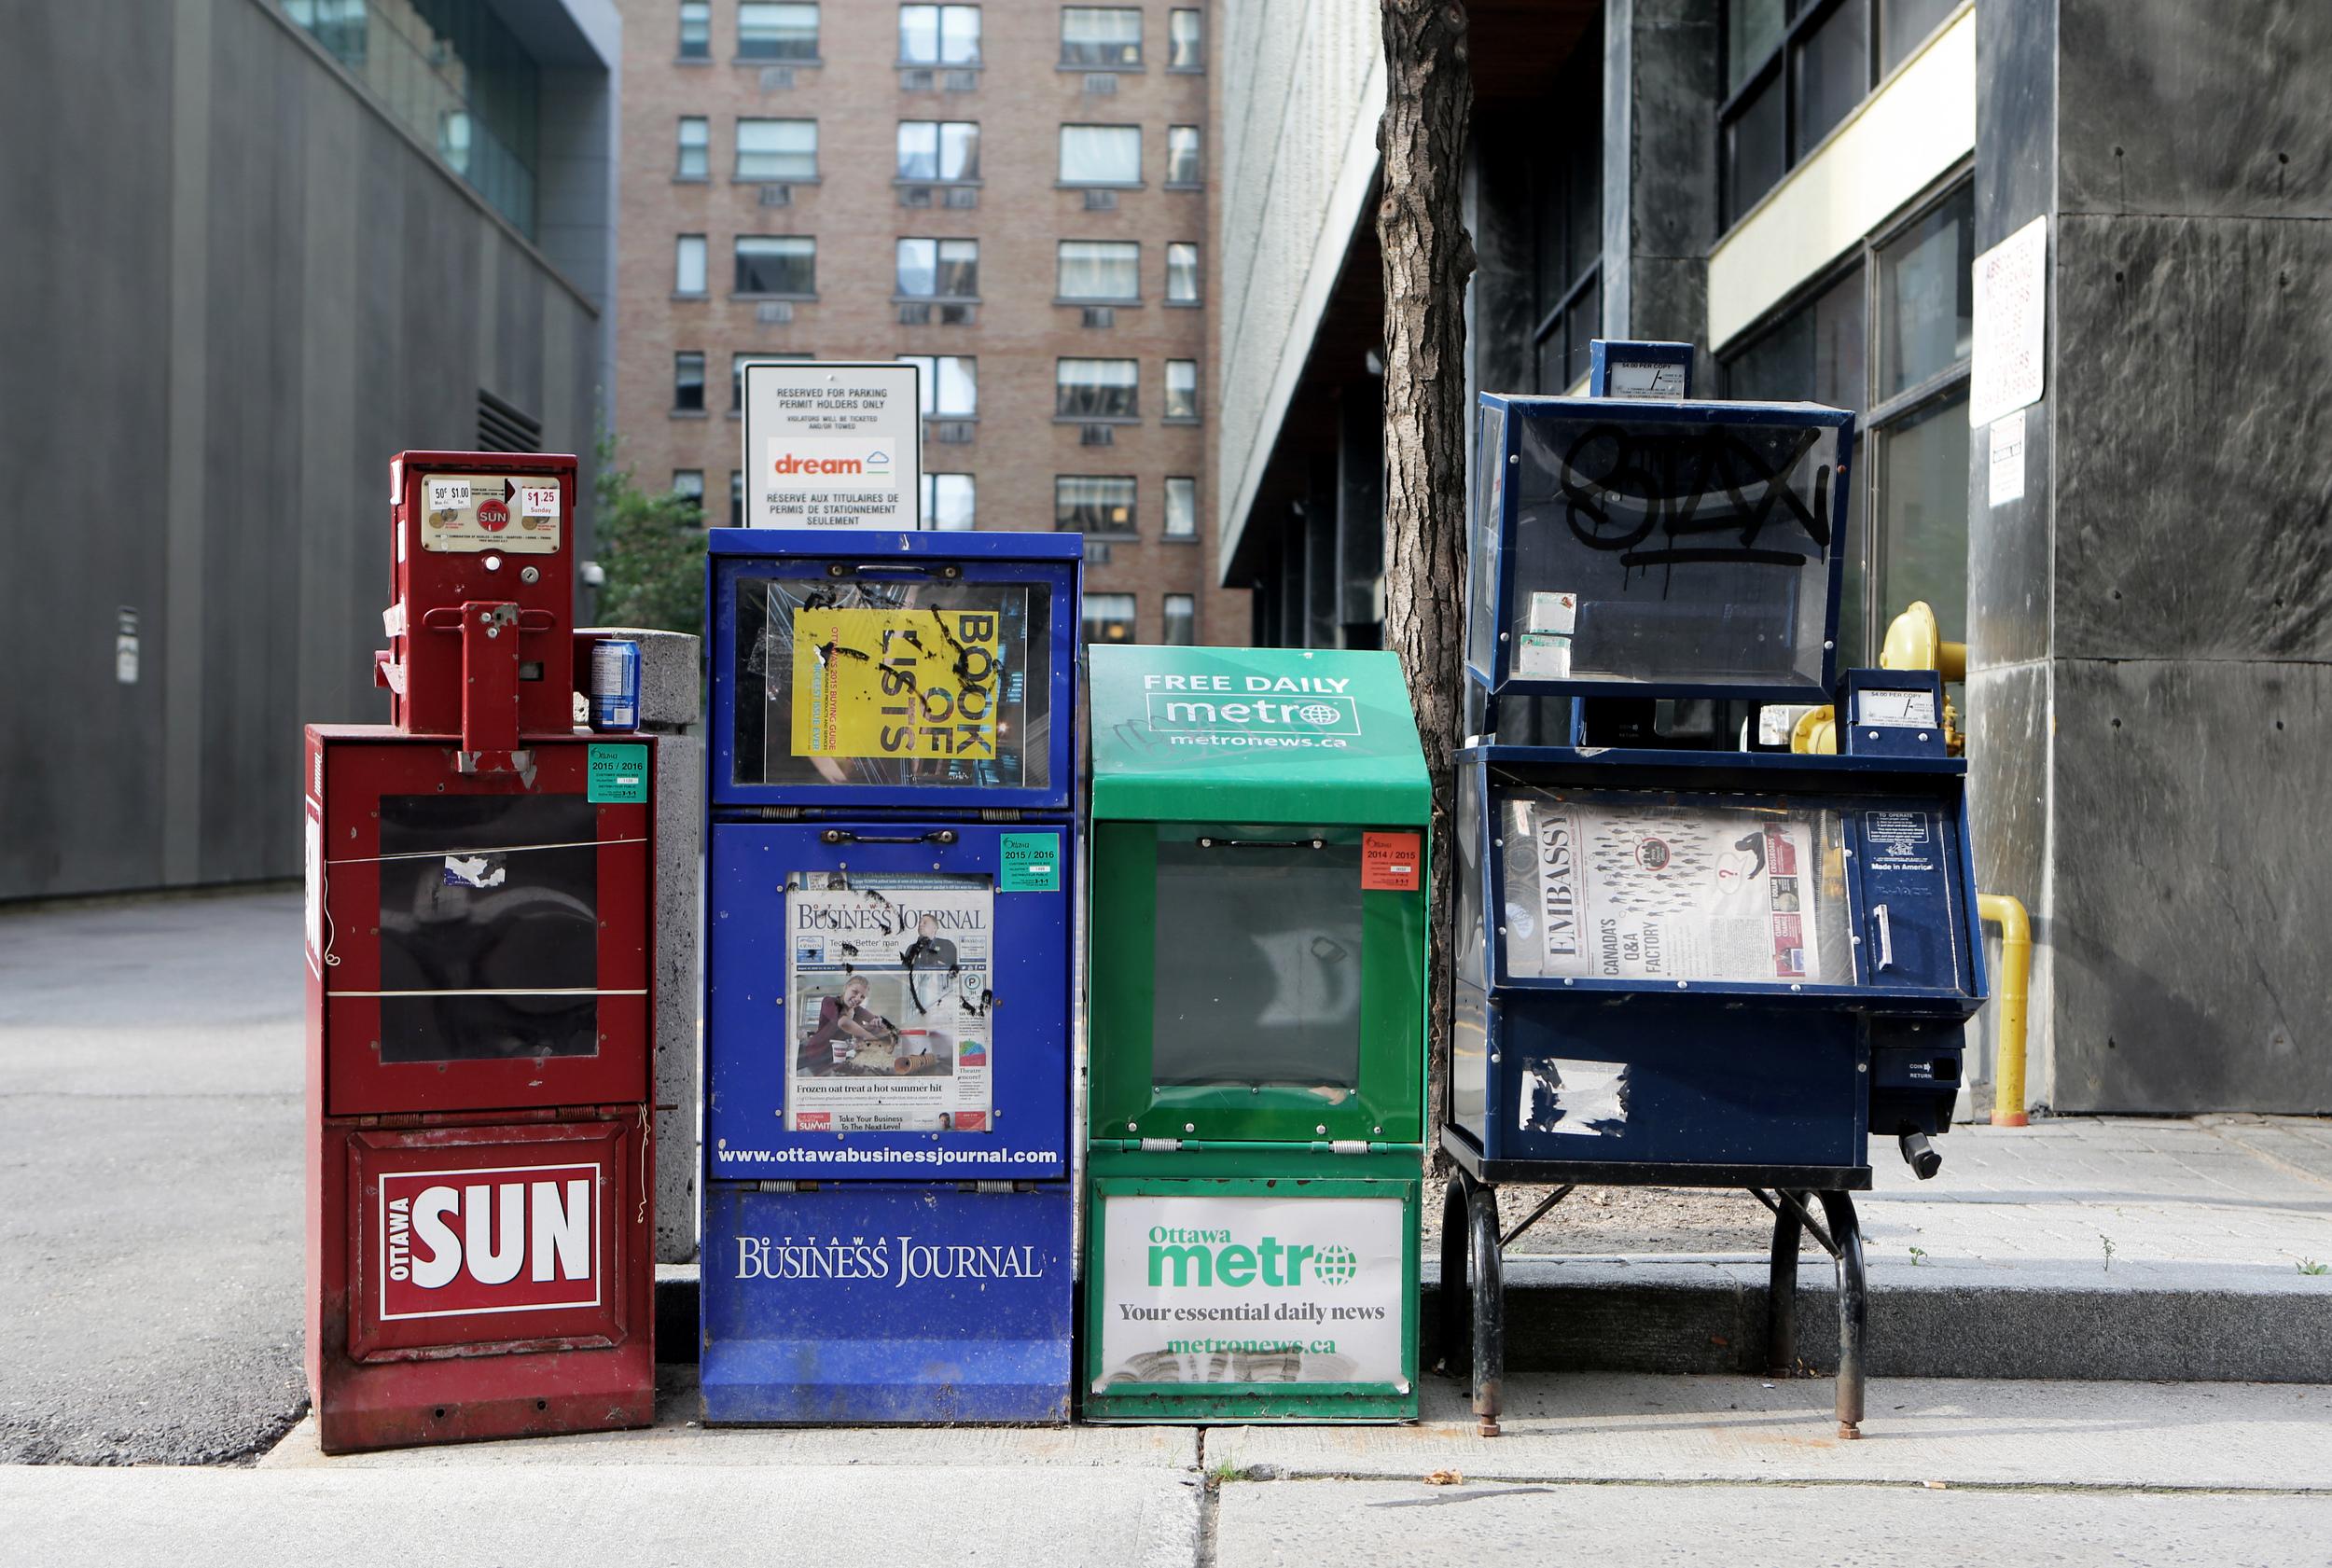 Life-of-Pix-free-stock-photos-city-distributors-newspapers-AlexisDoyen.jpg